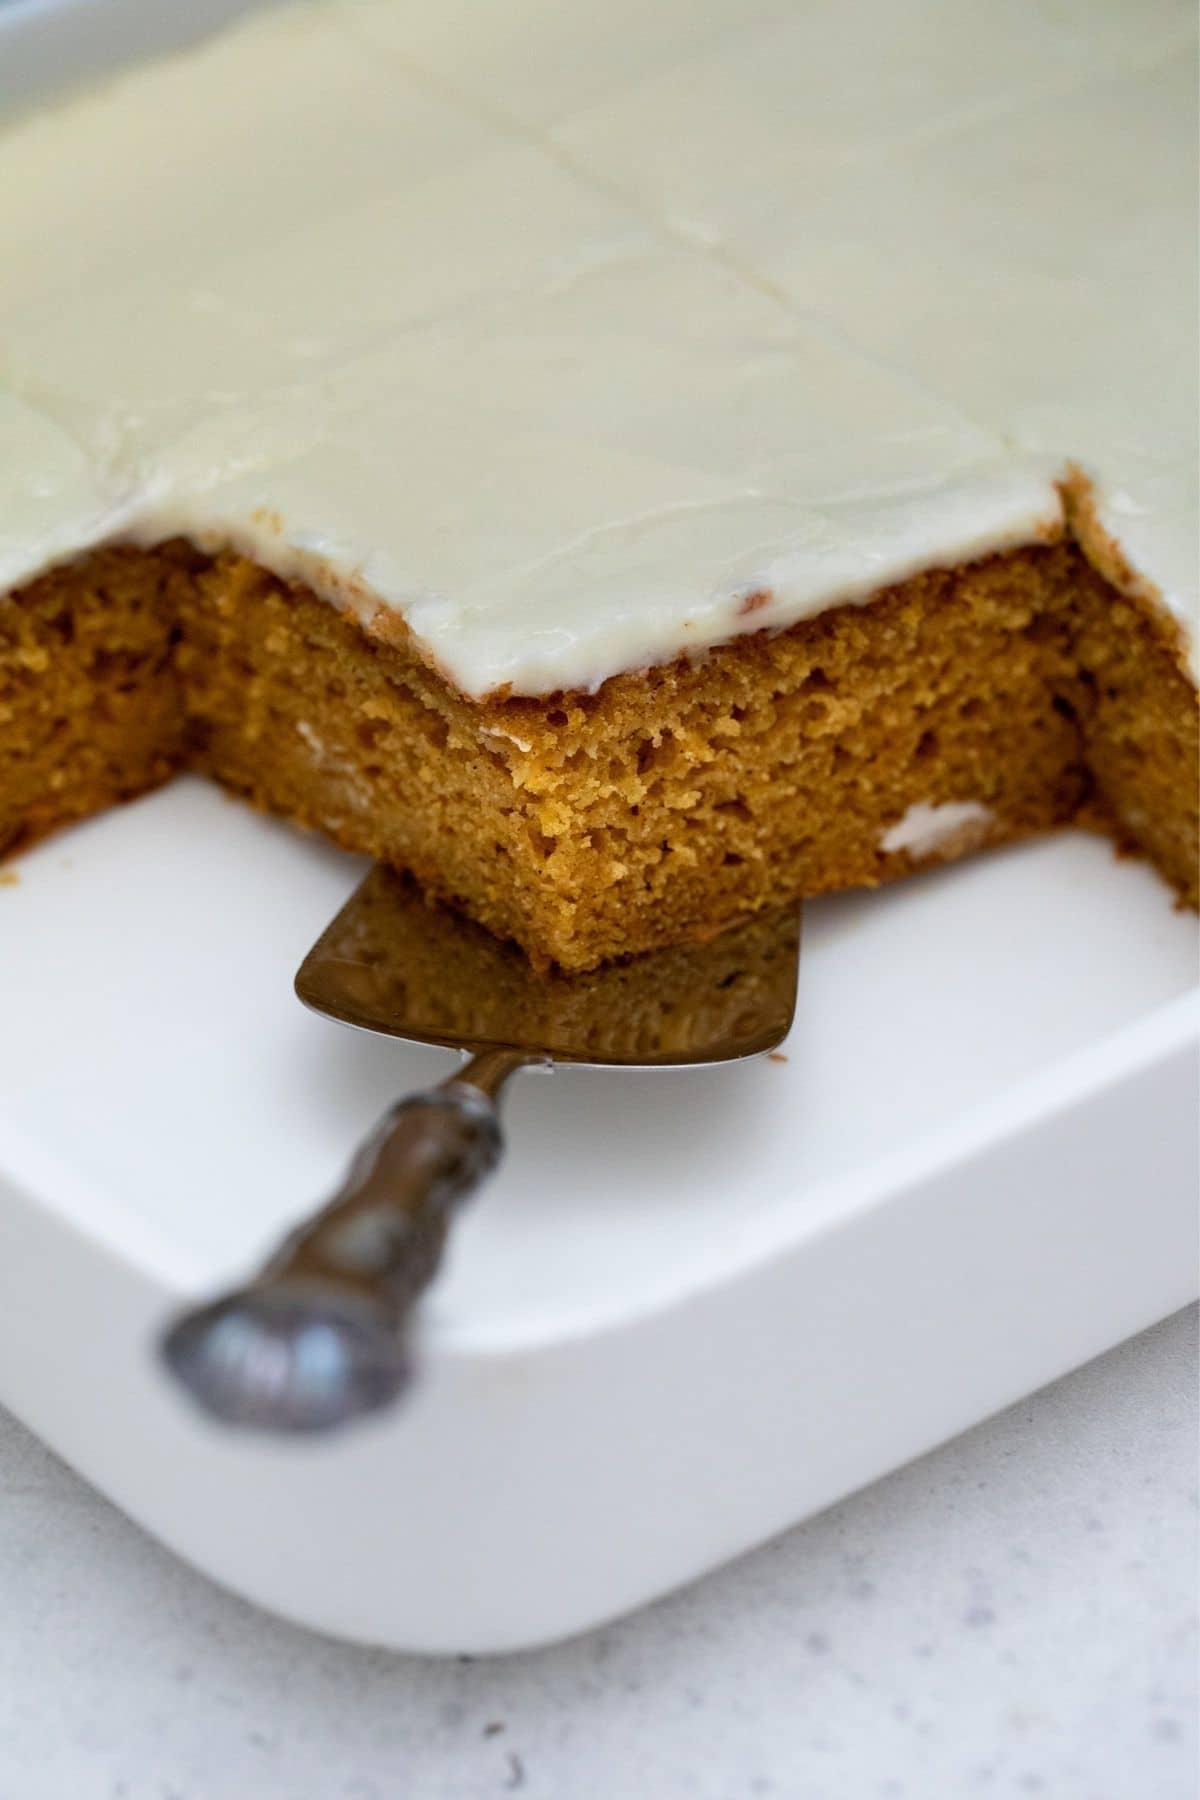 Metal spatula under cake slice in cake pan